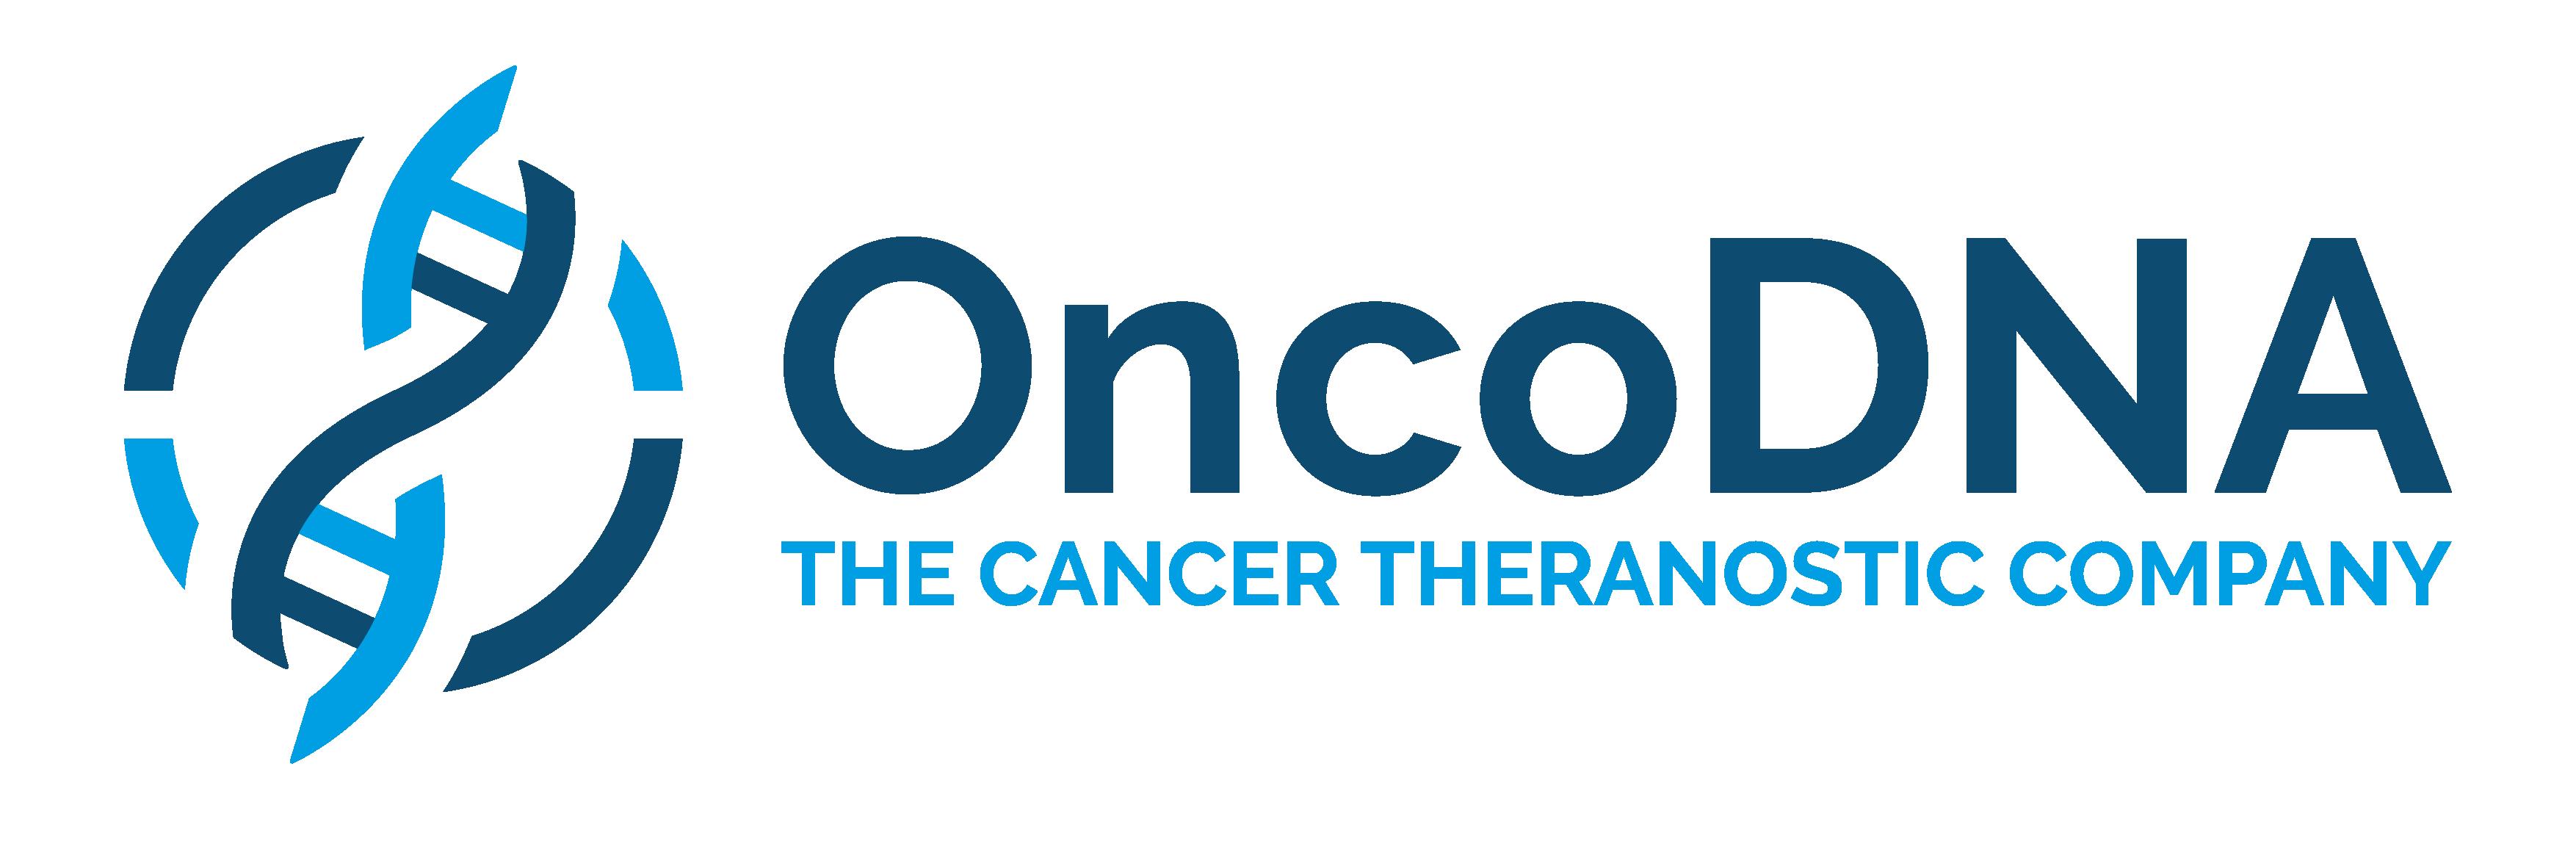 logo-oncodna-new-blue-01.png